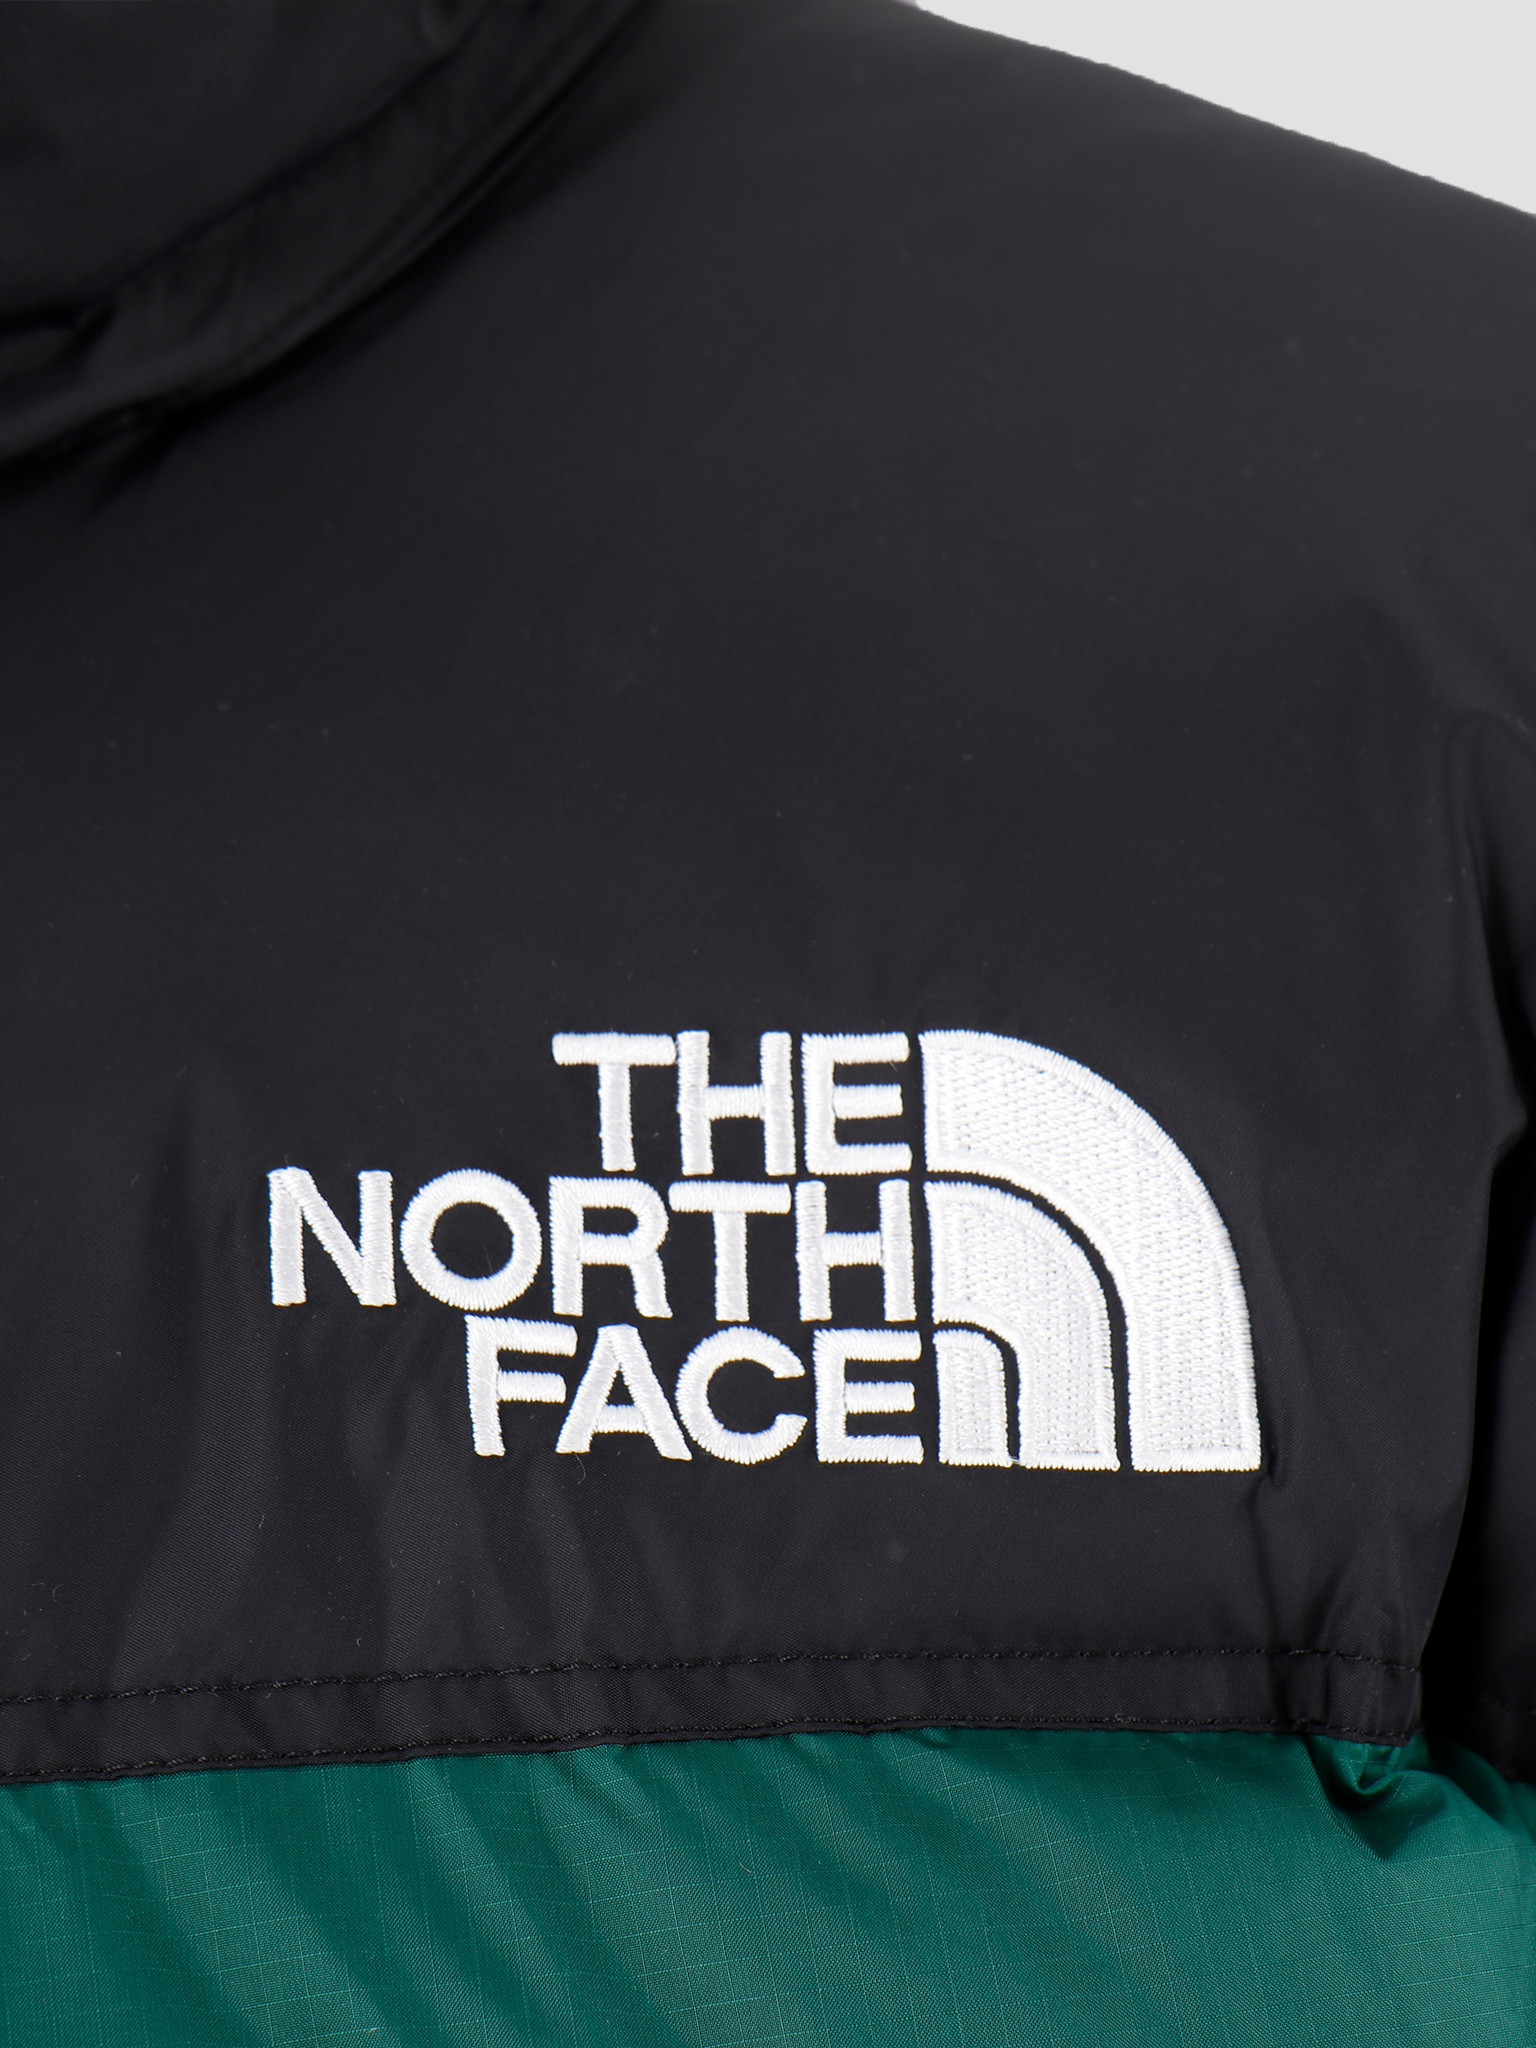 The North Face The North Face 1996 Retro Nuptse Jacket Night Green T93C8DN3P